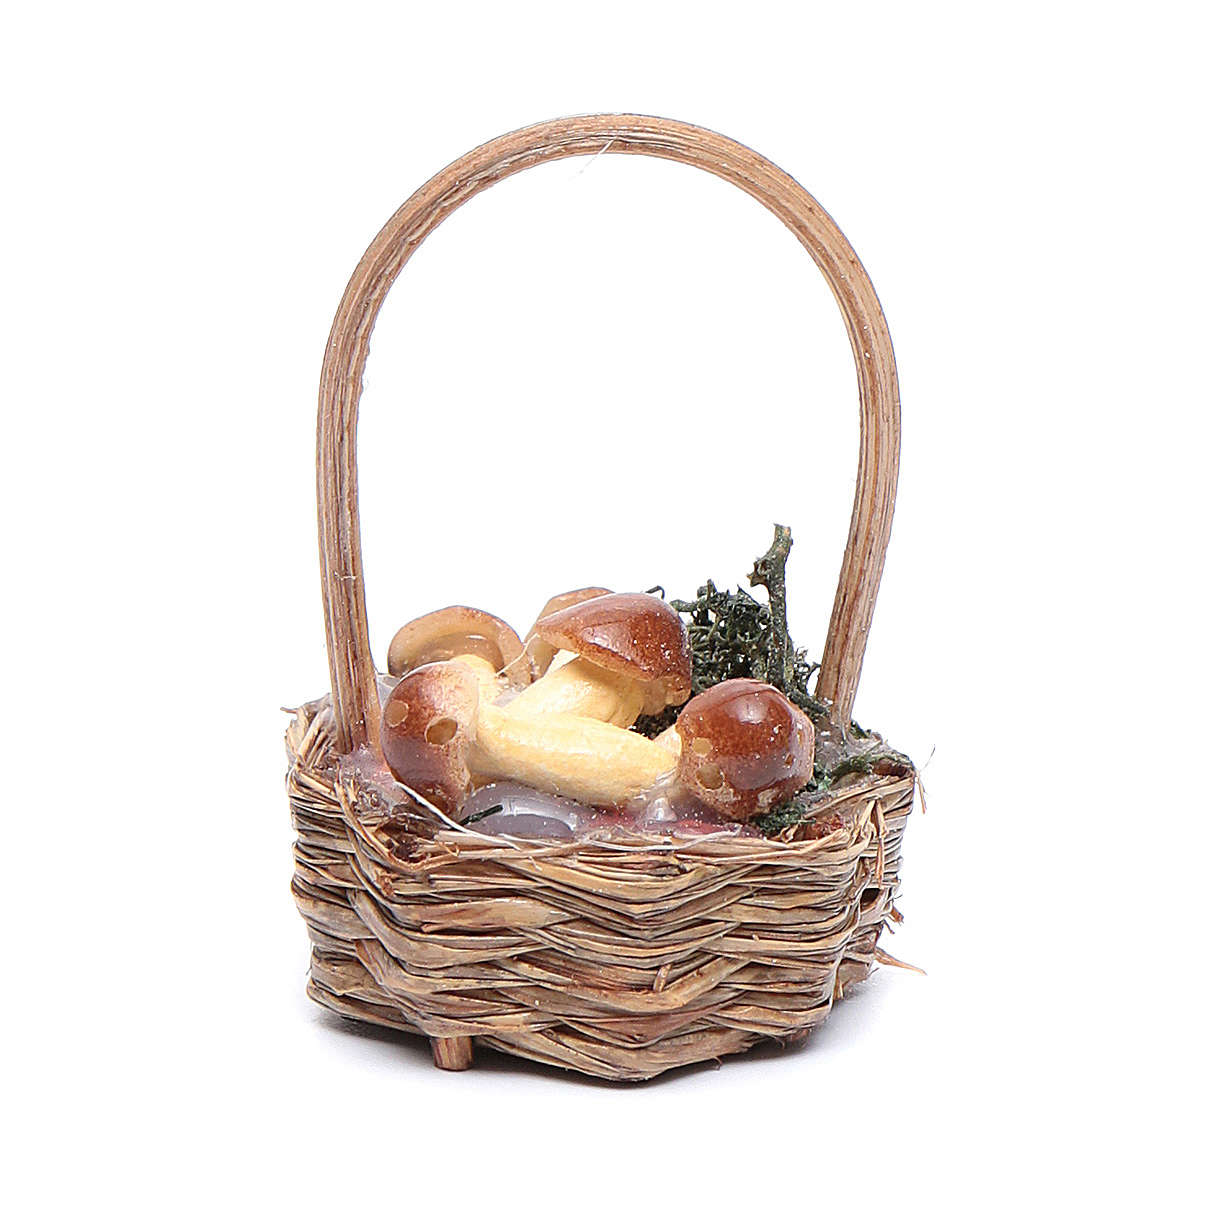 Mushroom basket, Neapolitan nativity scene 4